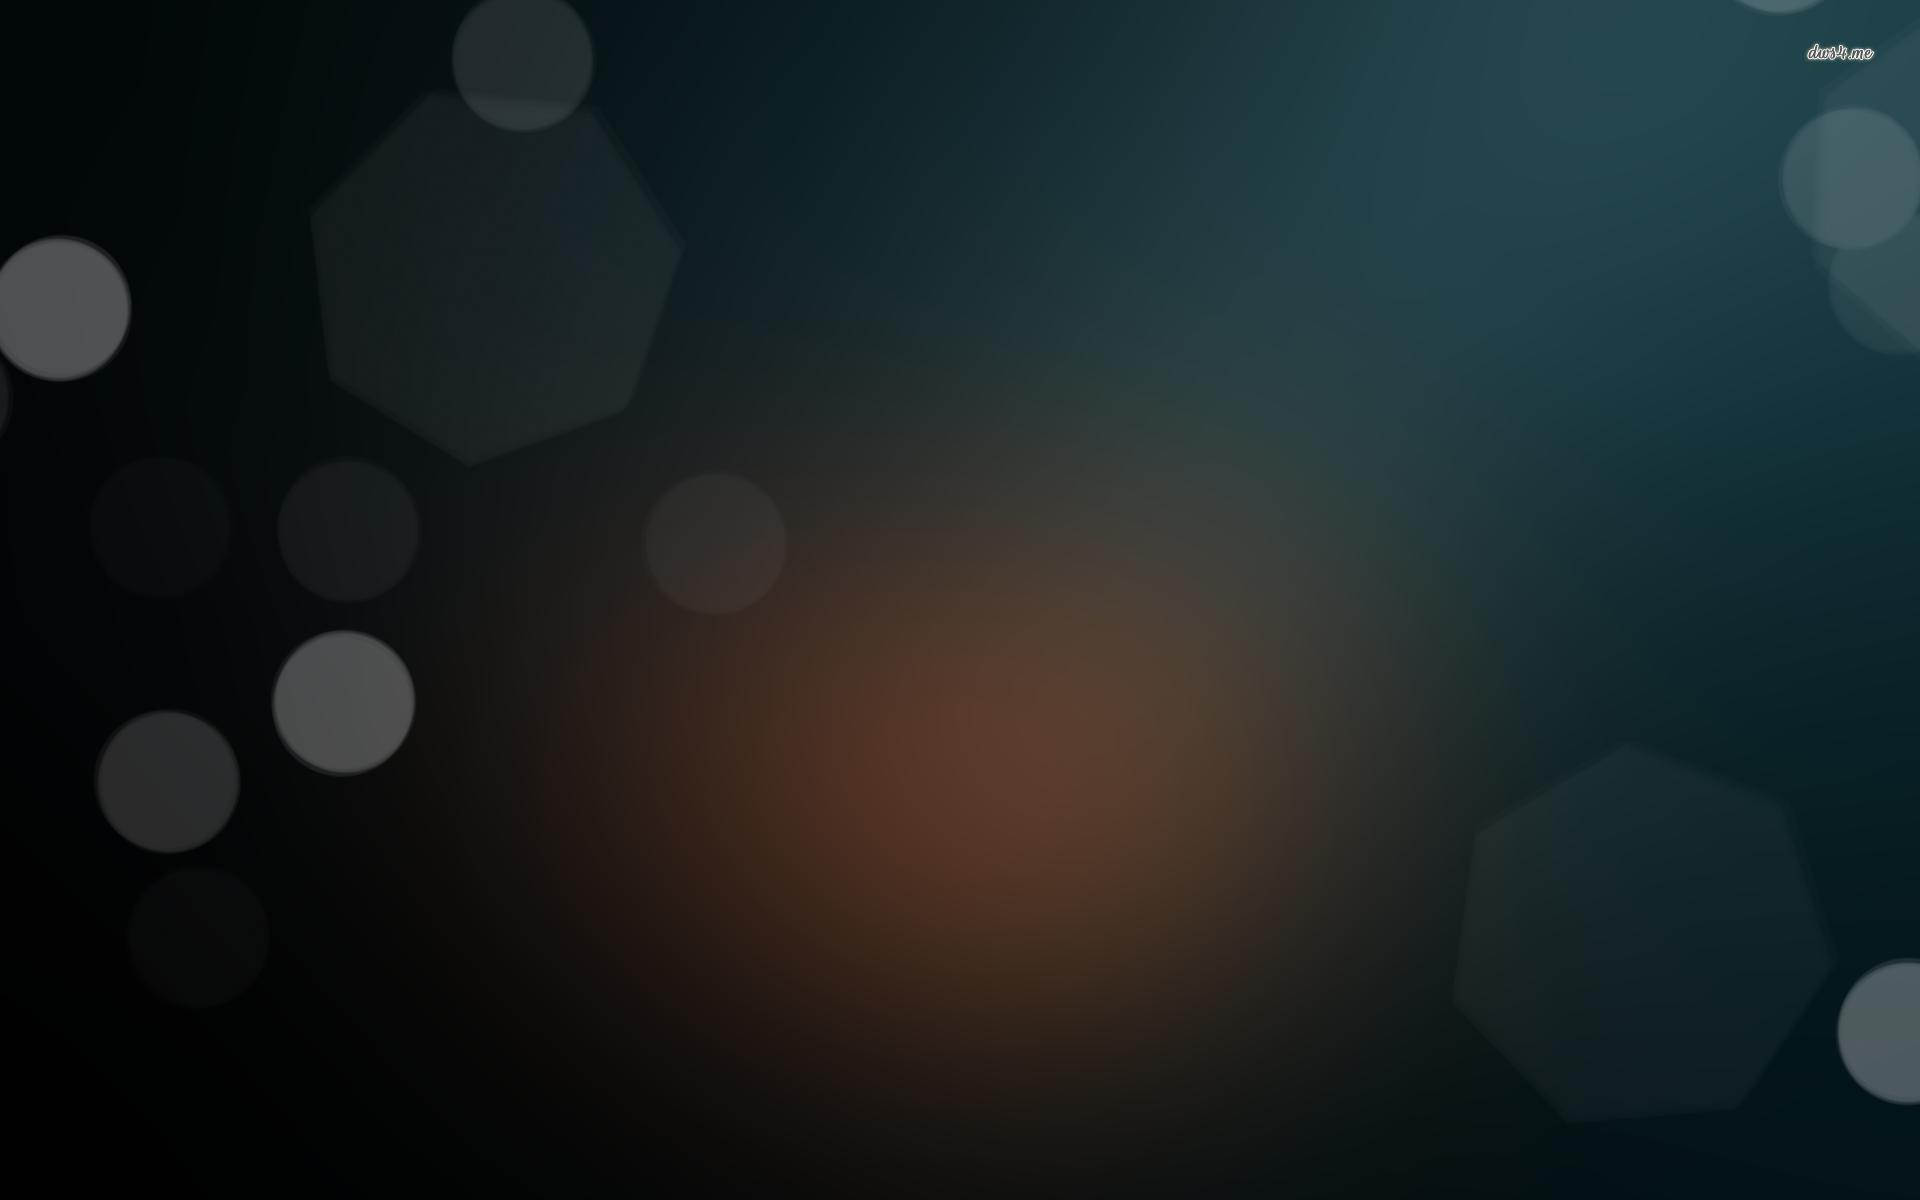 blurry circles wallpaper 679851